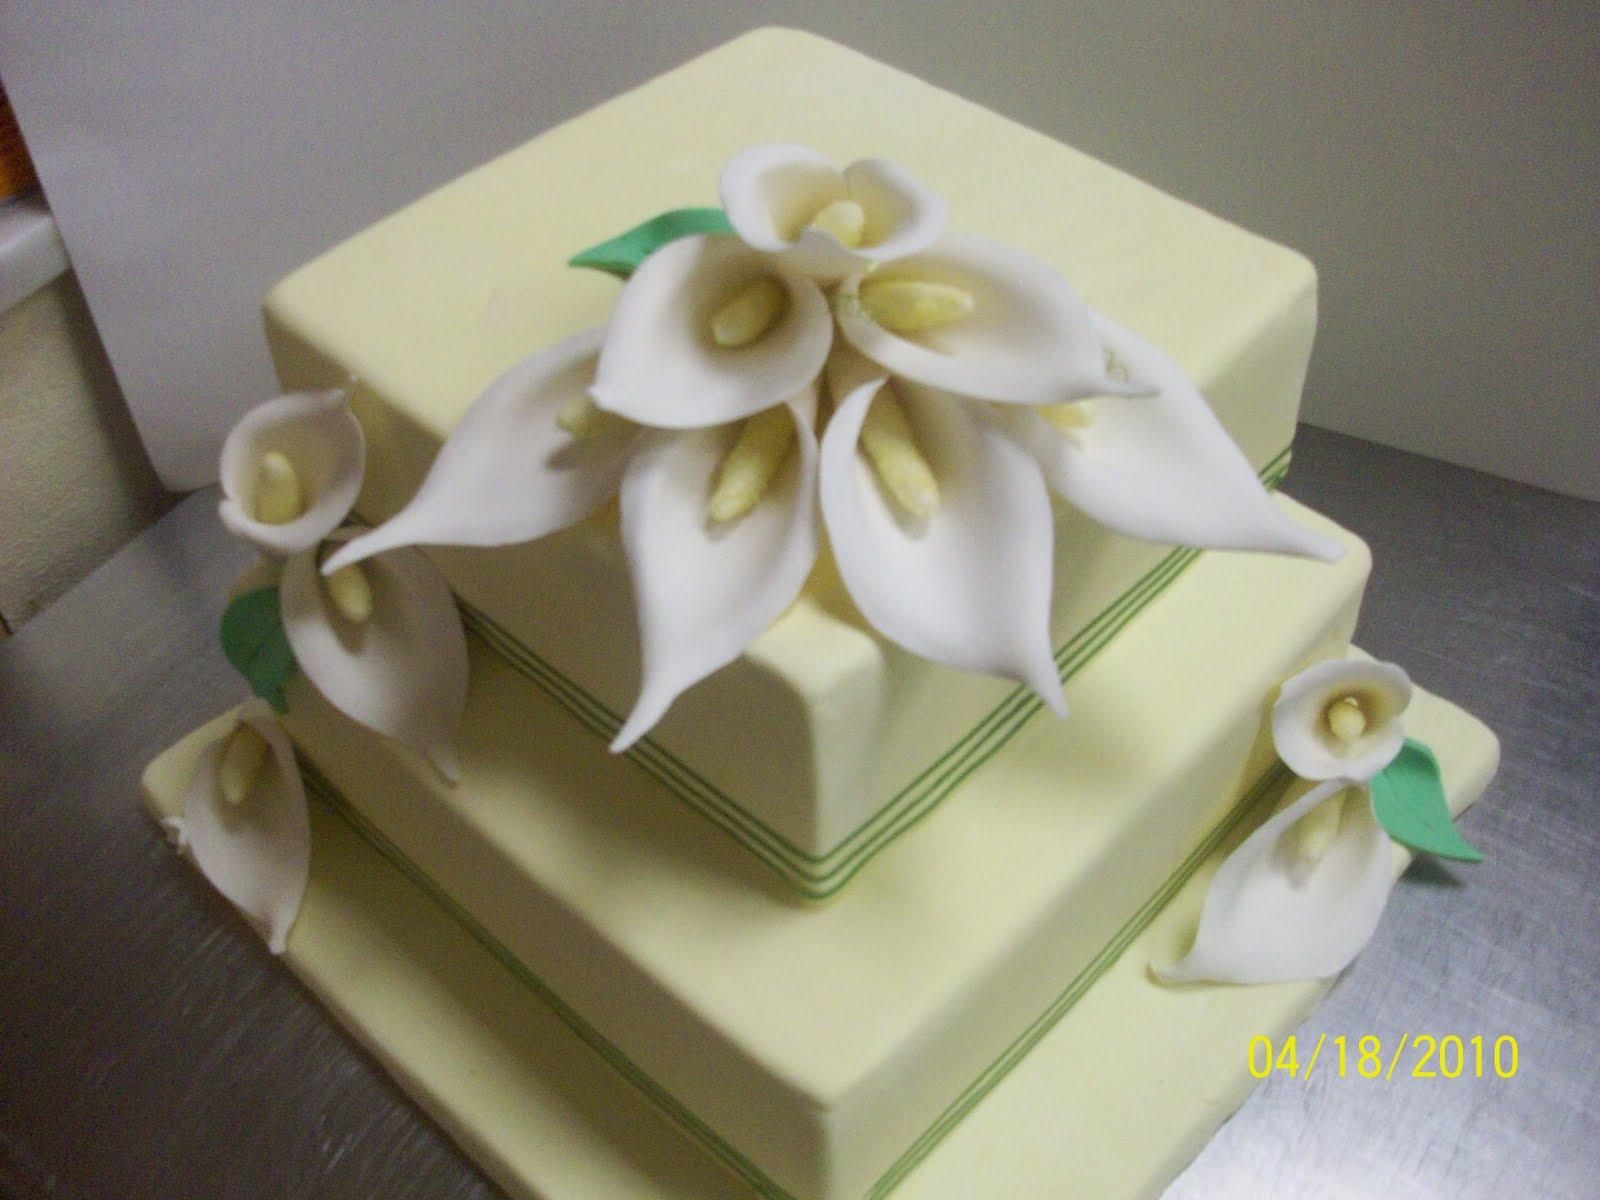 jpccs cakes custom cakes